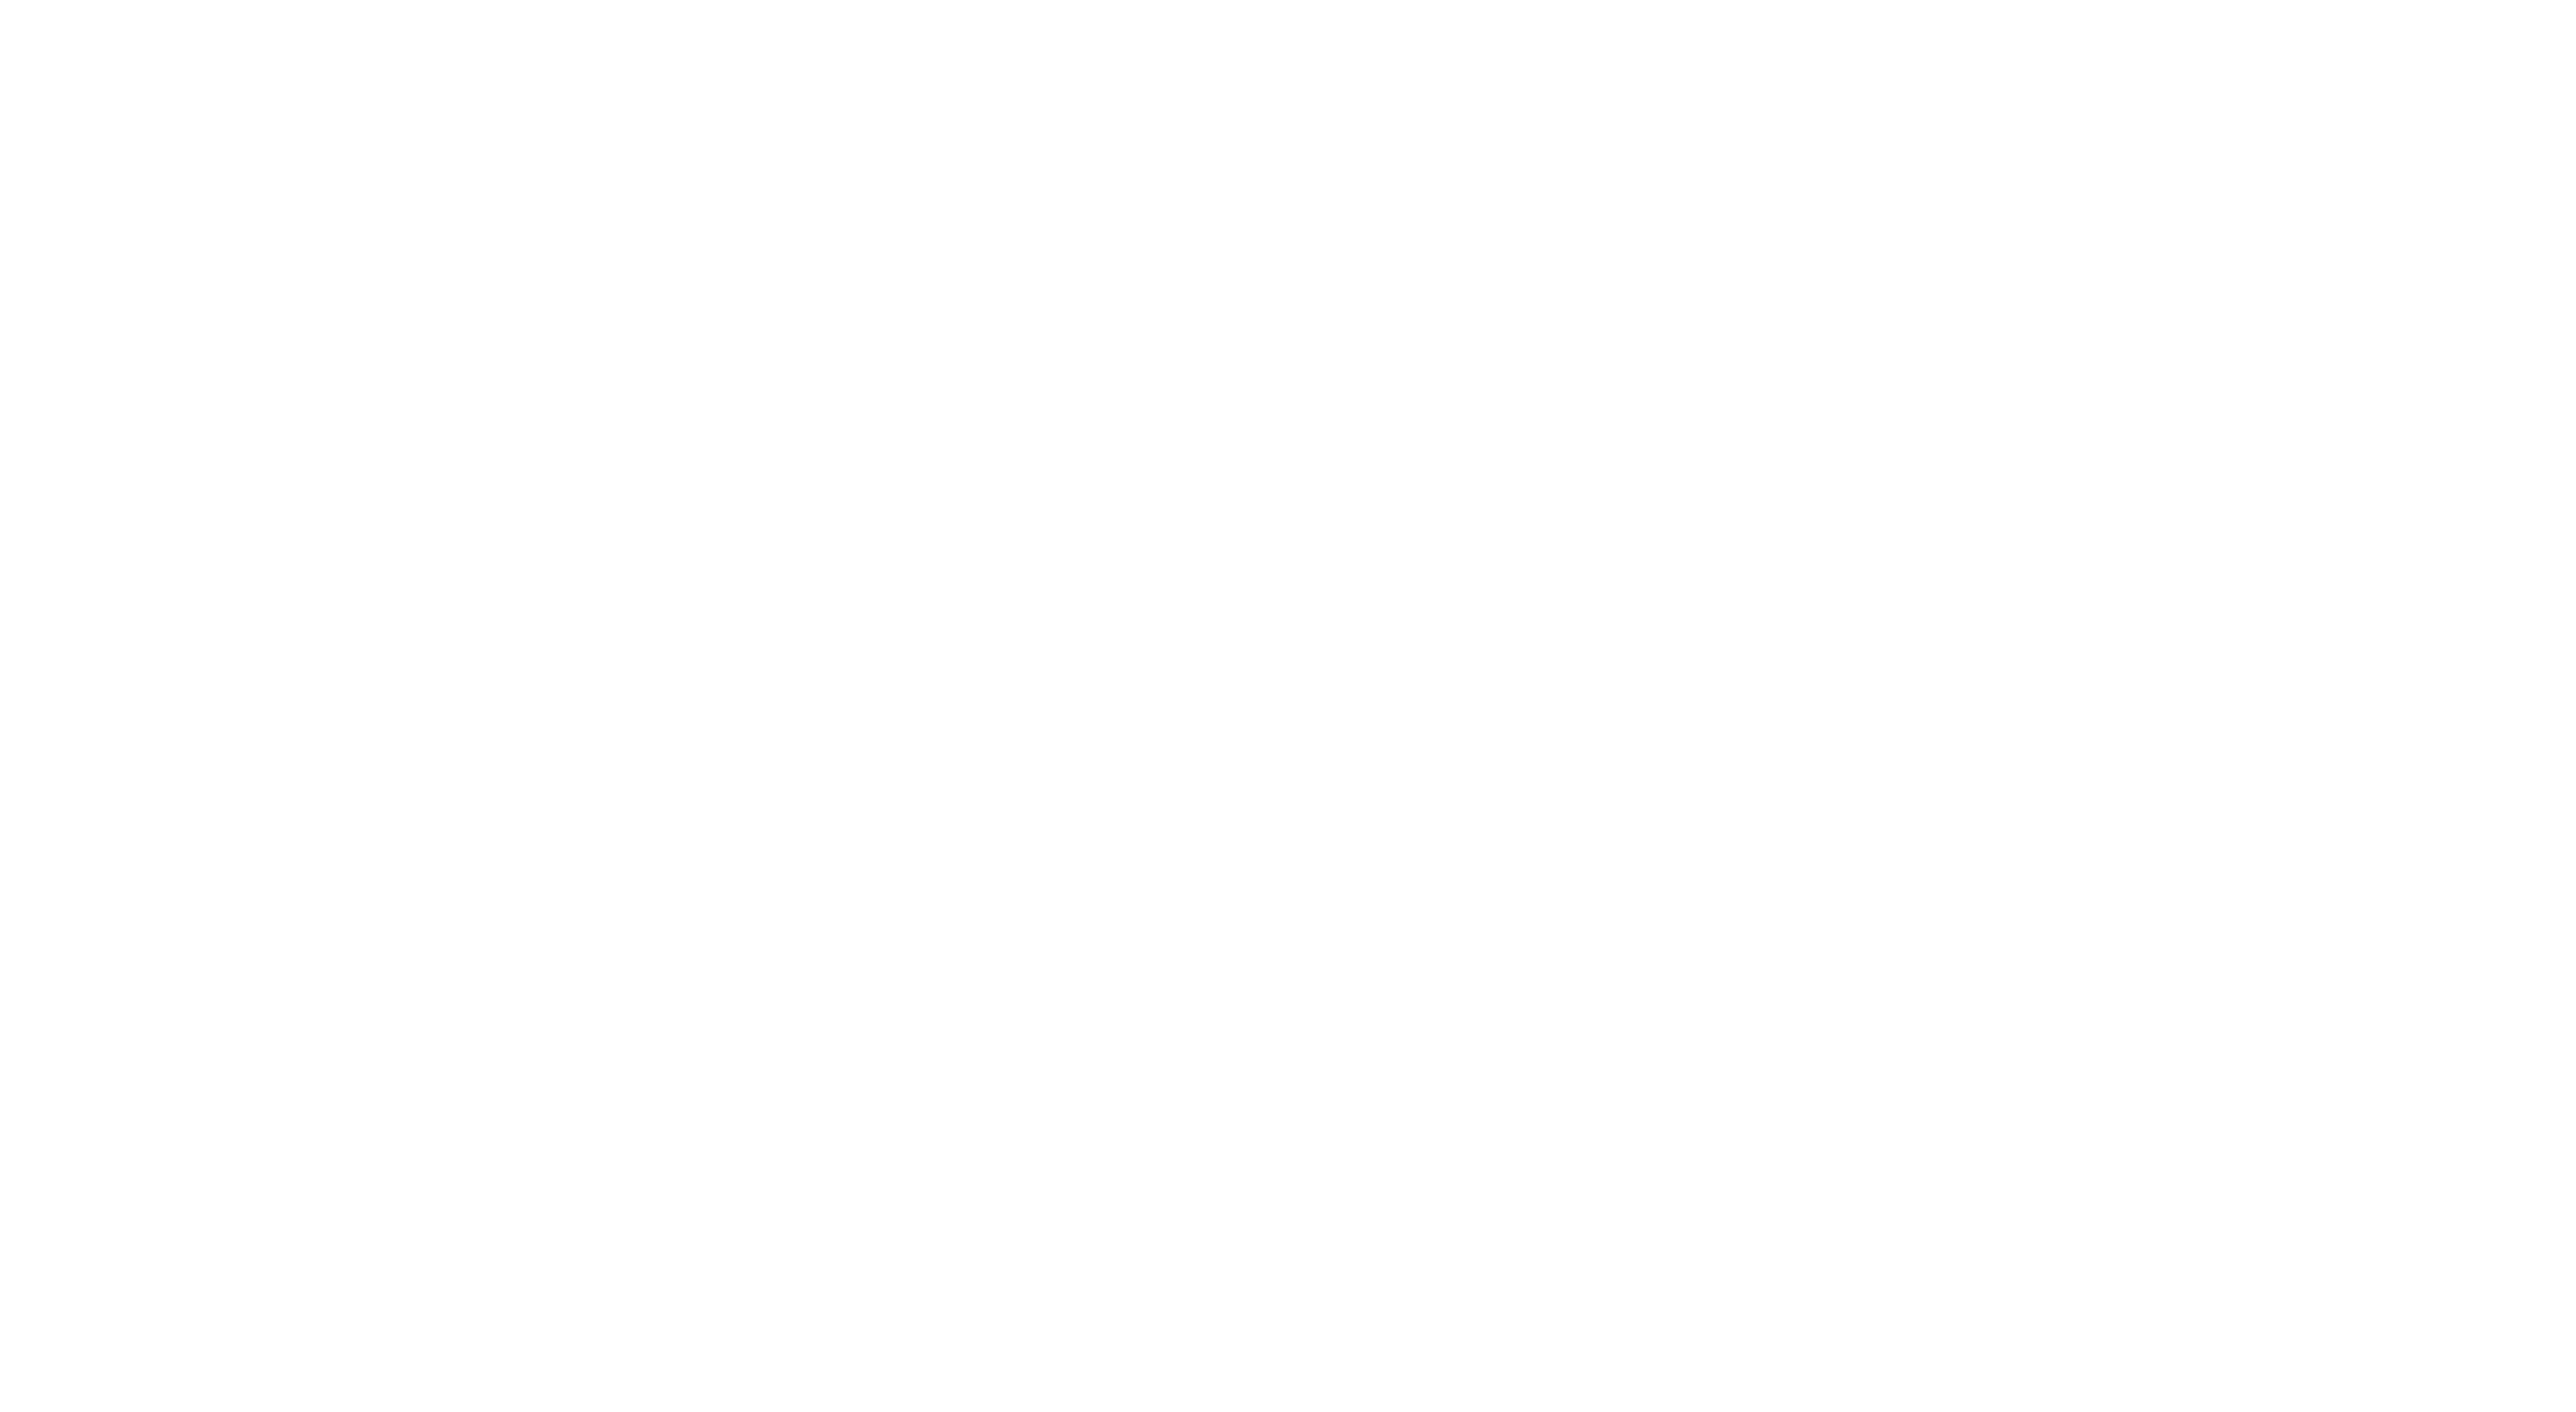 huxley logo white